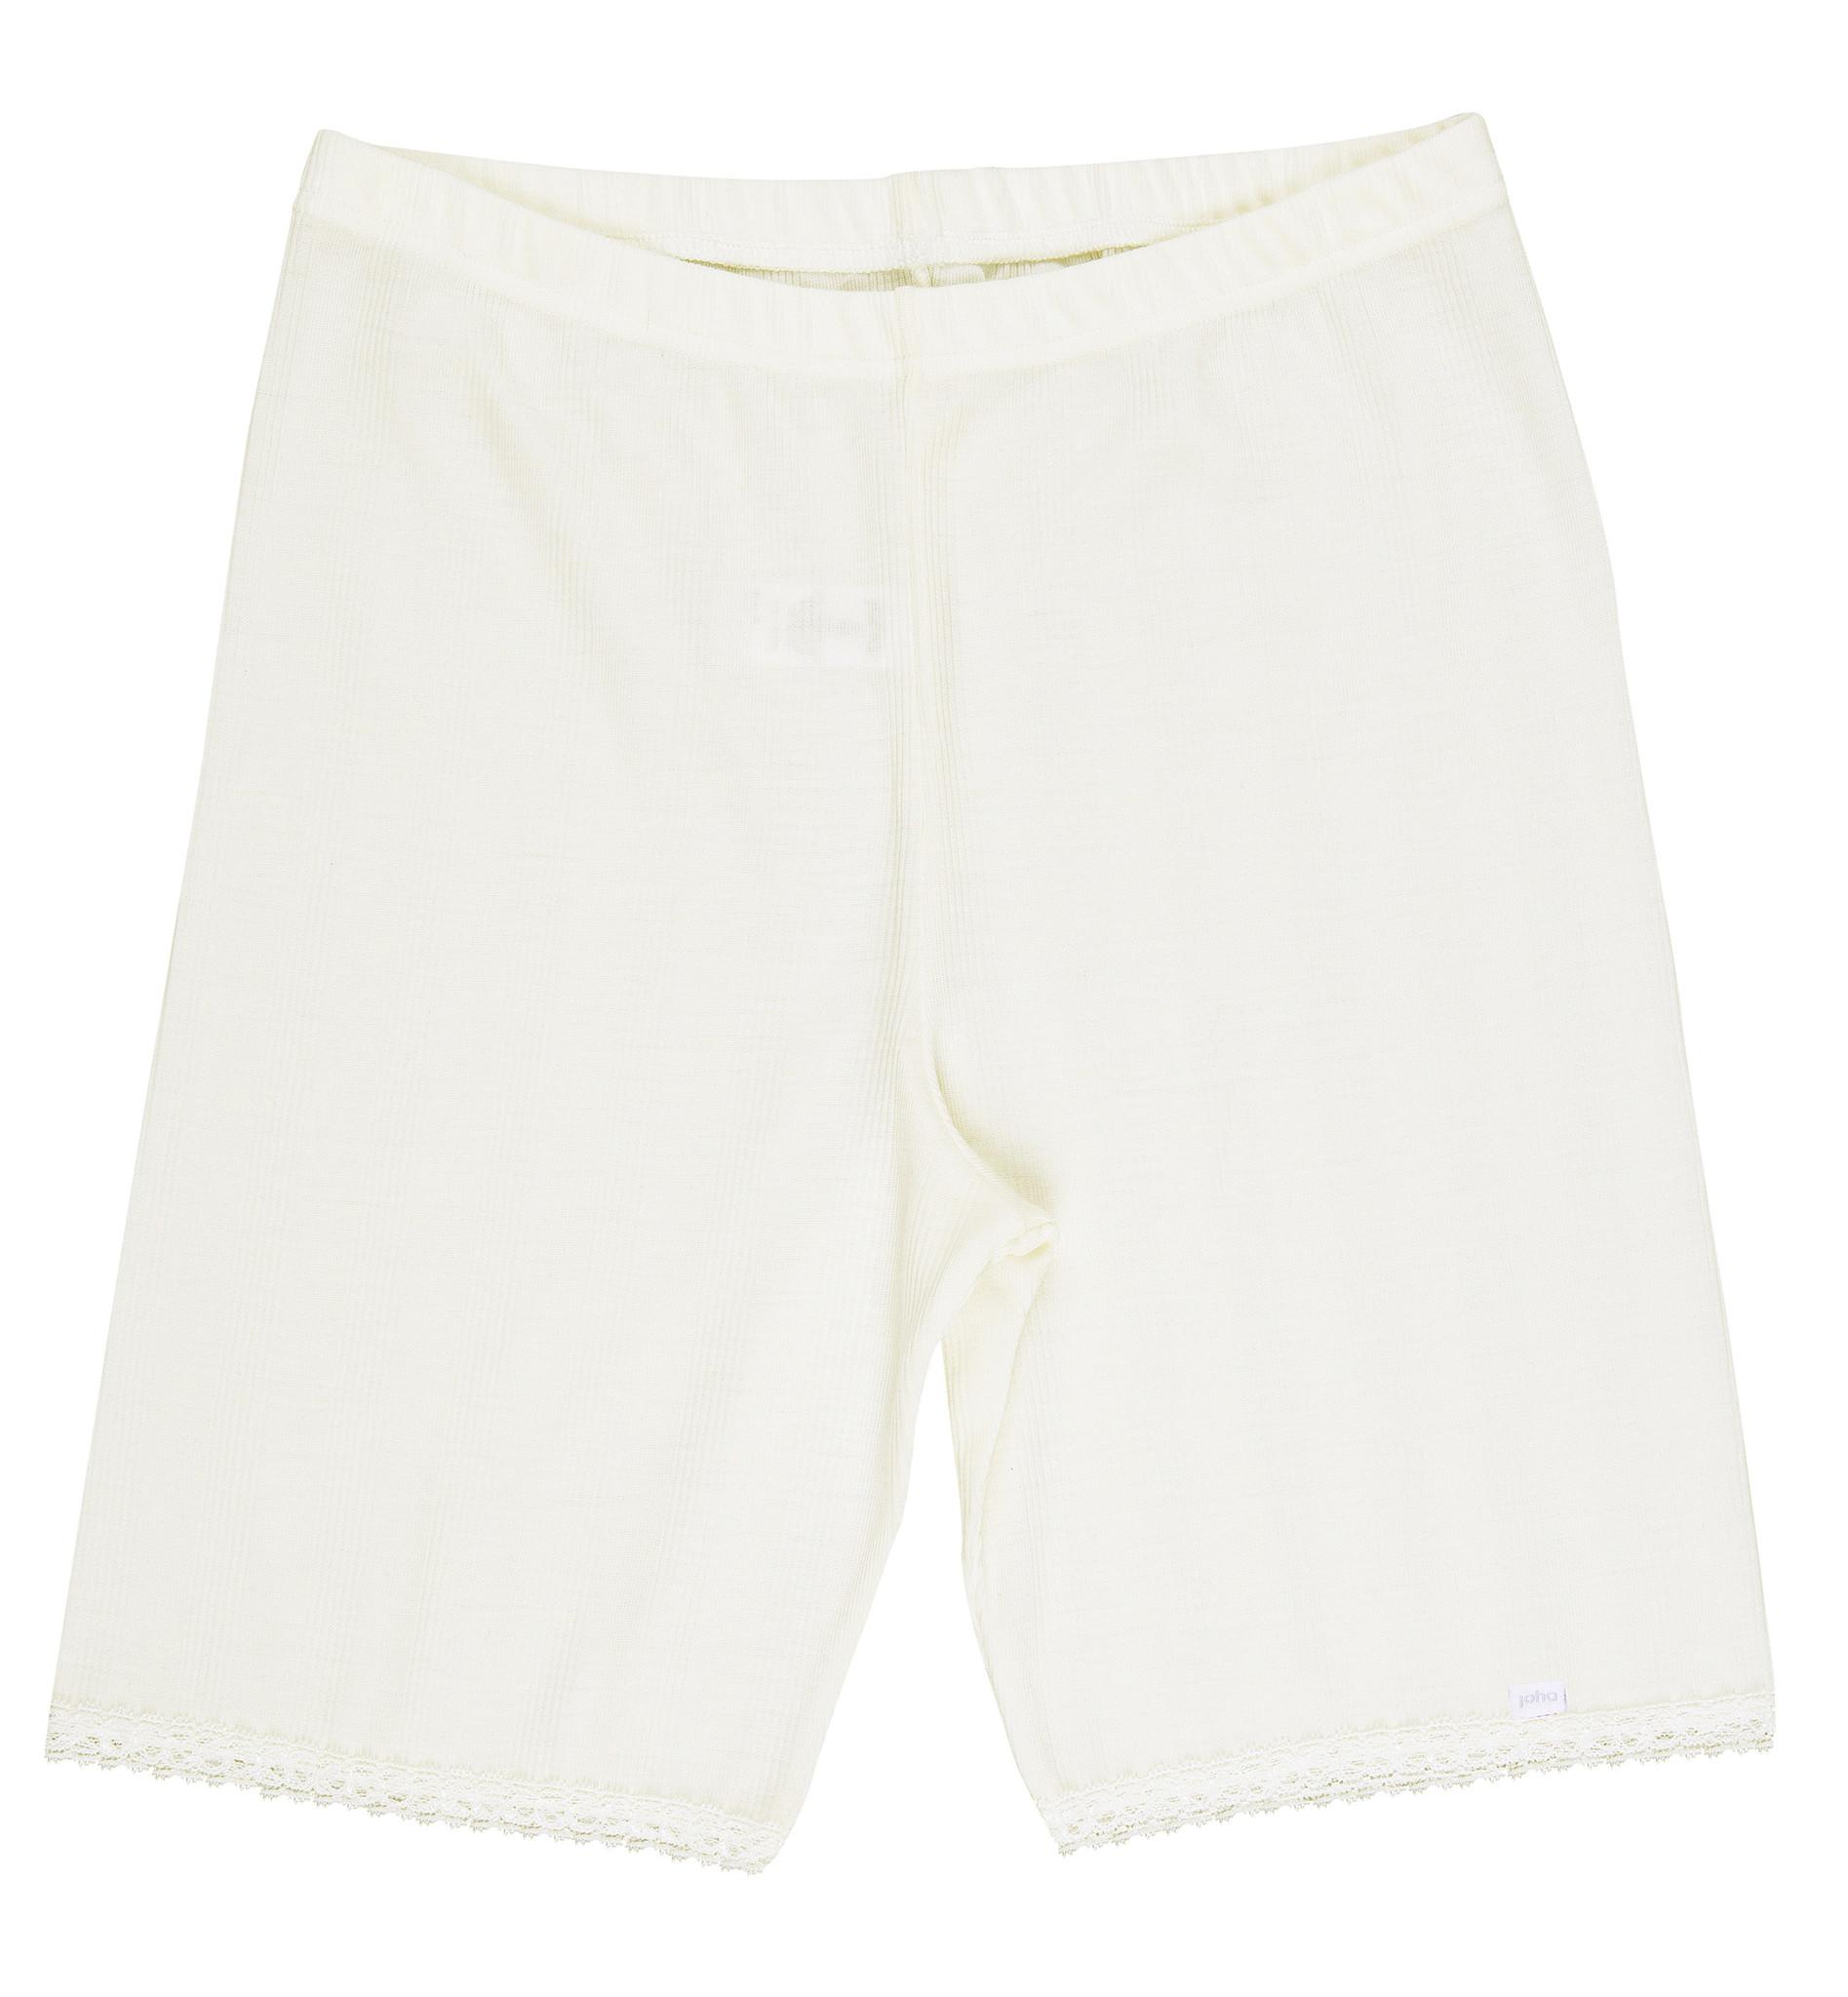 Joha Joha Damesslip Shorts Wol/Zijde - Ecru (50) Collectie Filippa